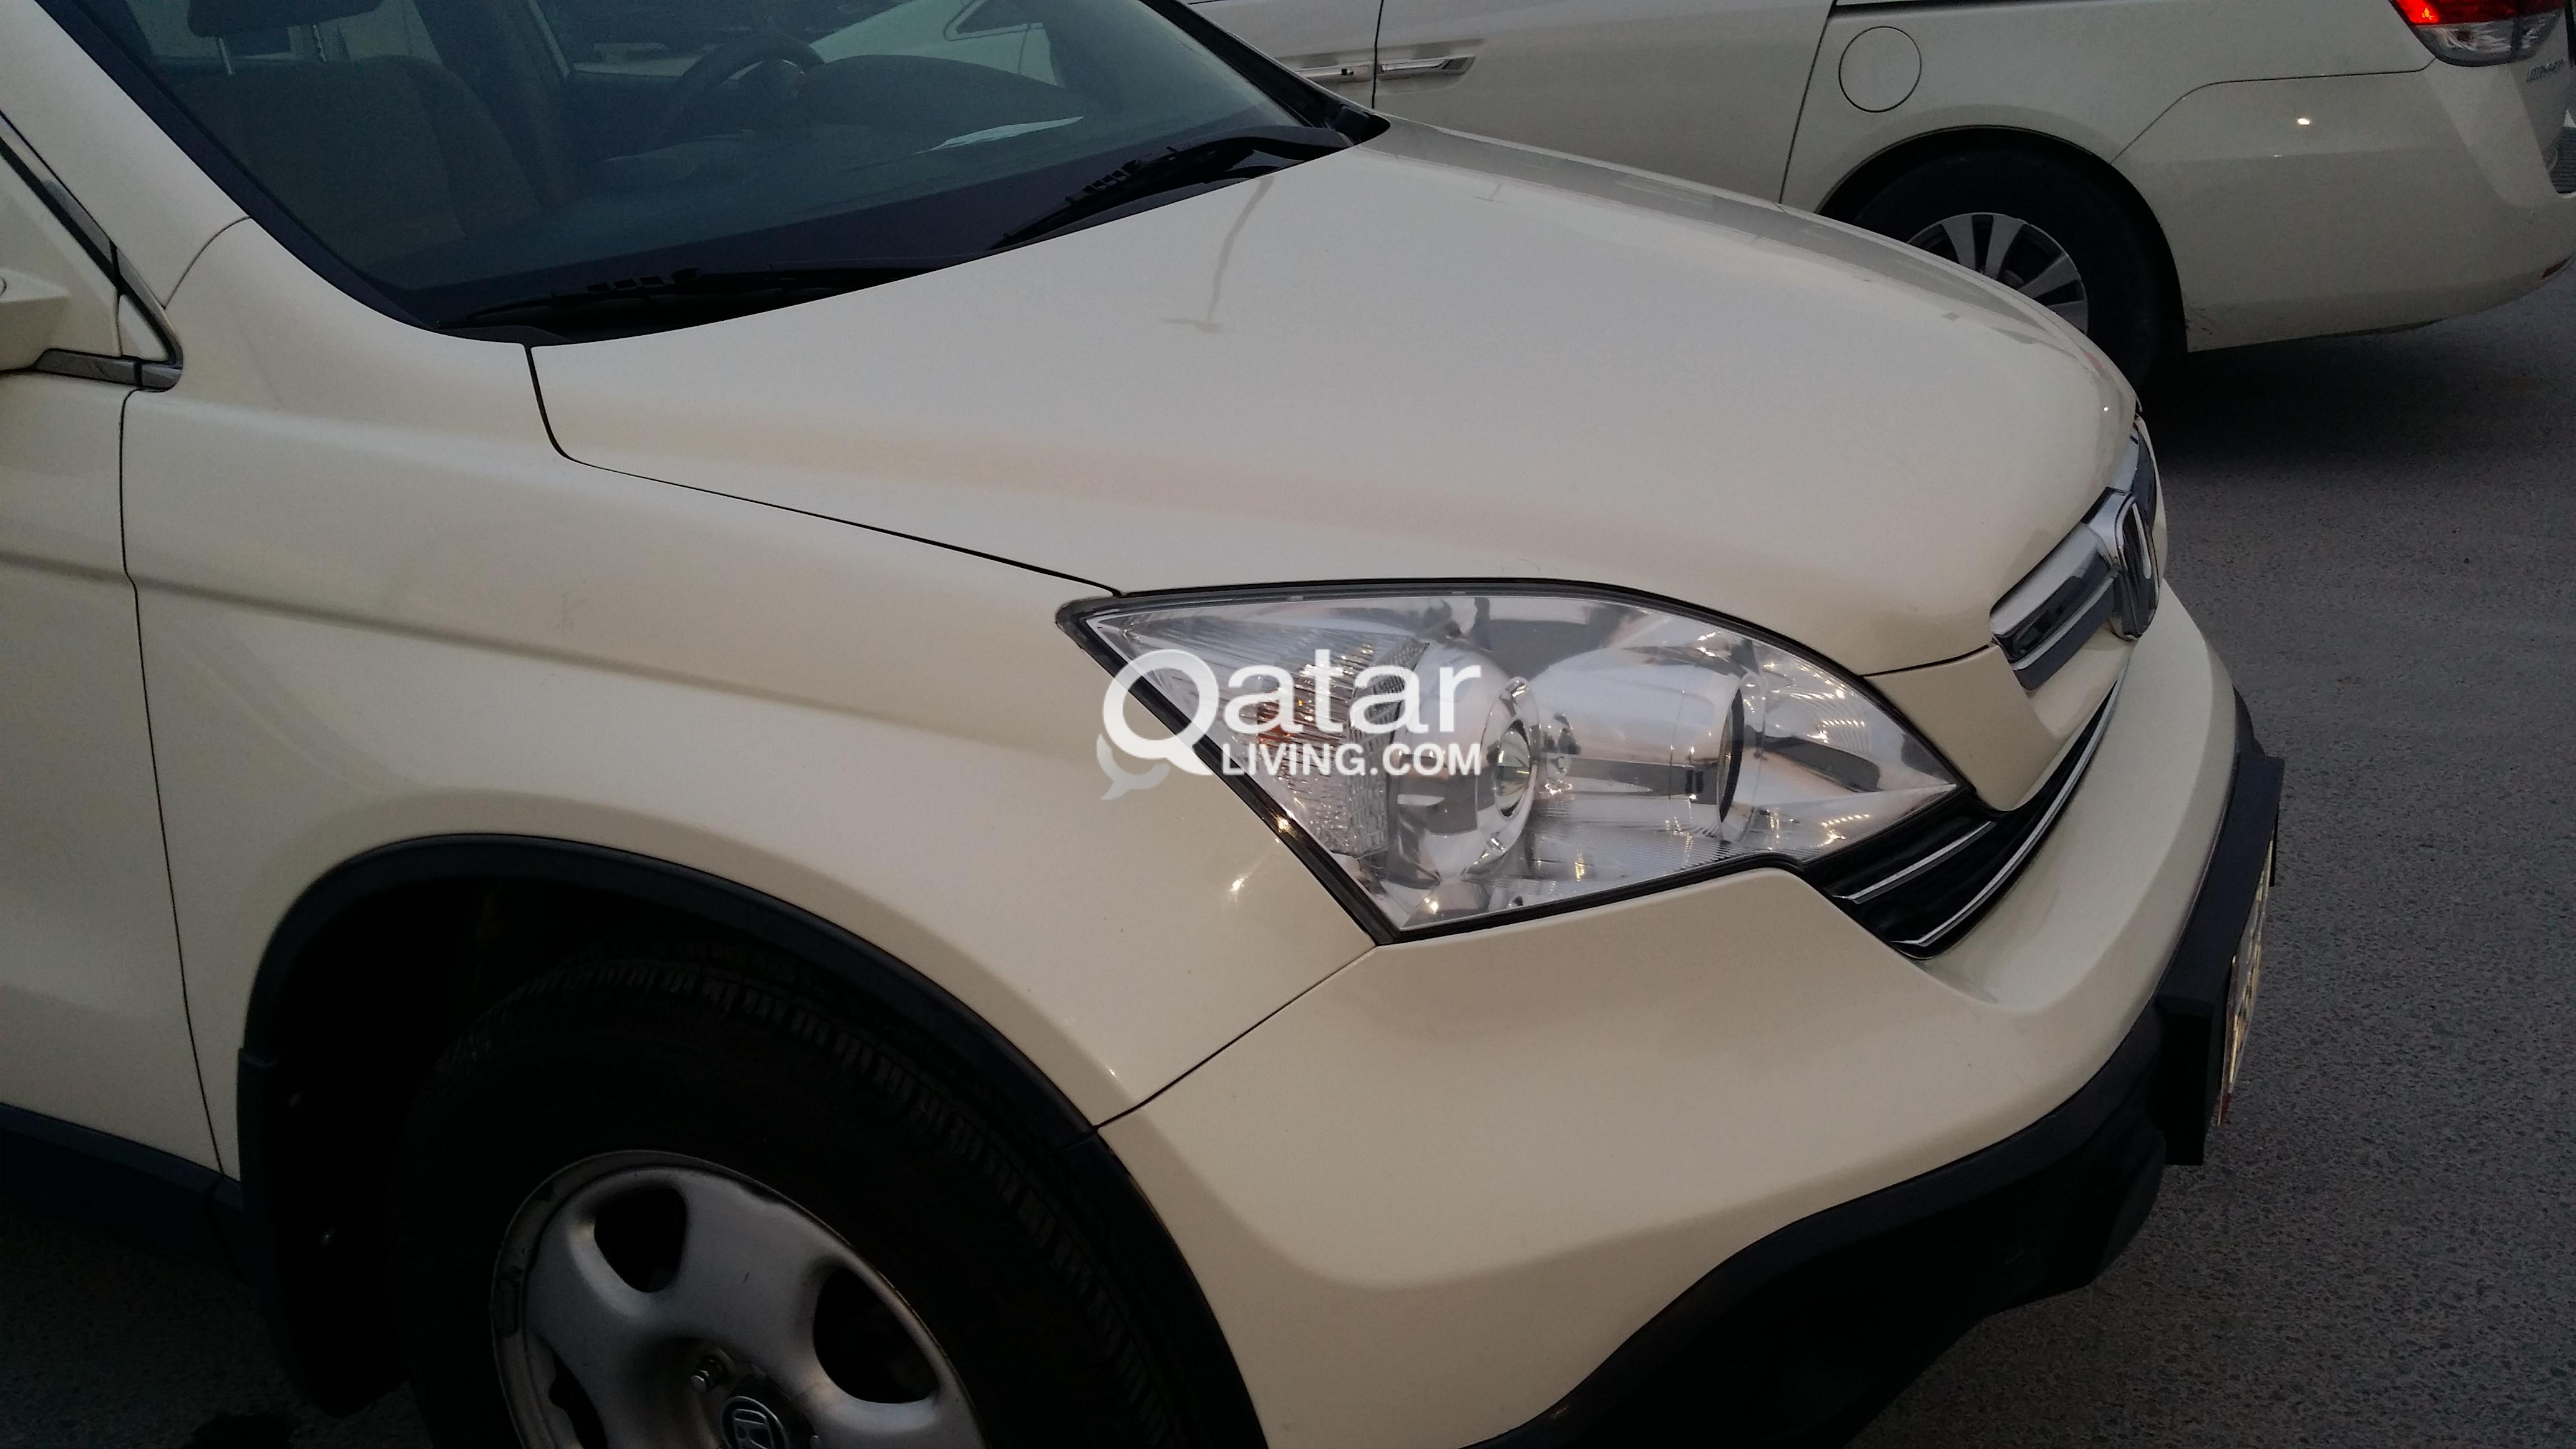 Honda Crv Pearl White Excellent Family Used Urgent Sale Qatar Living